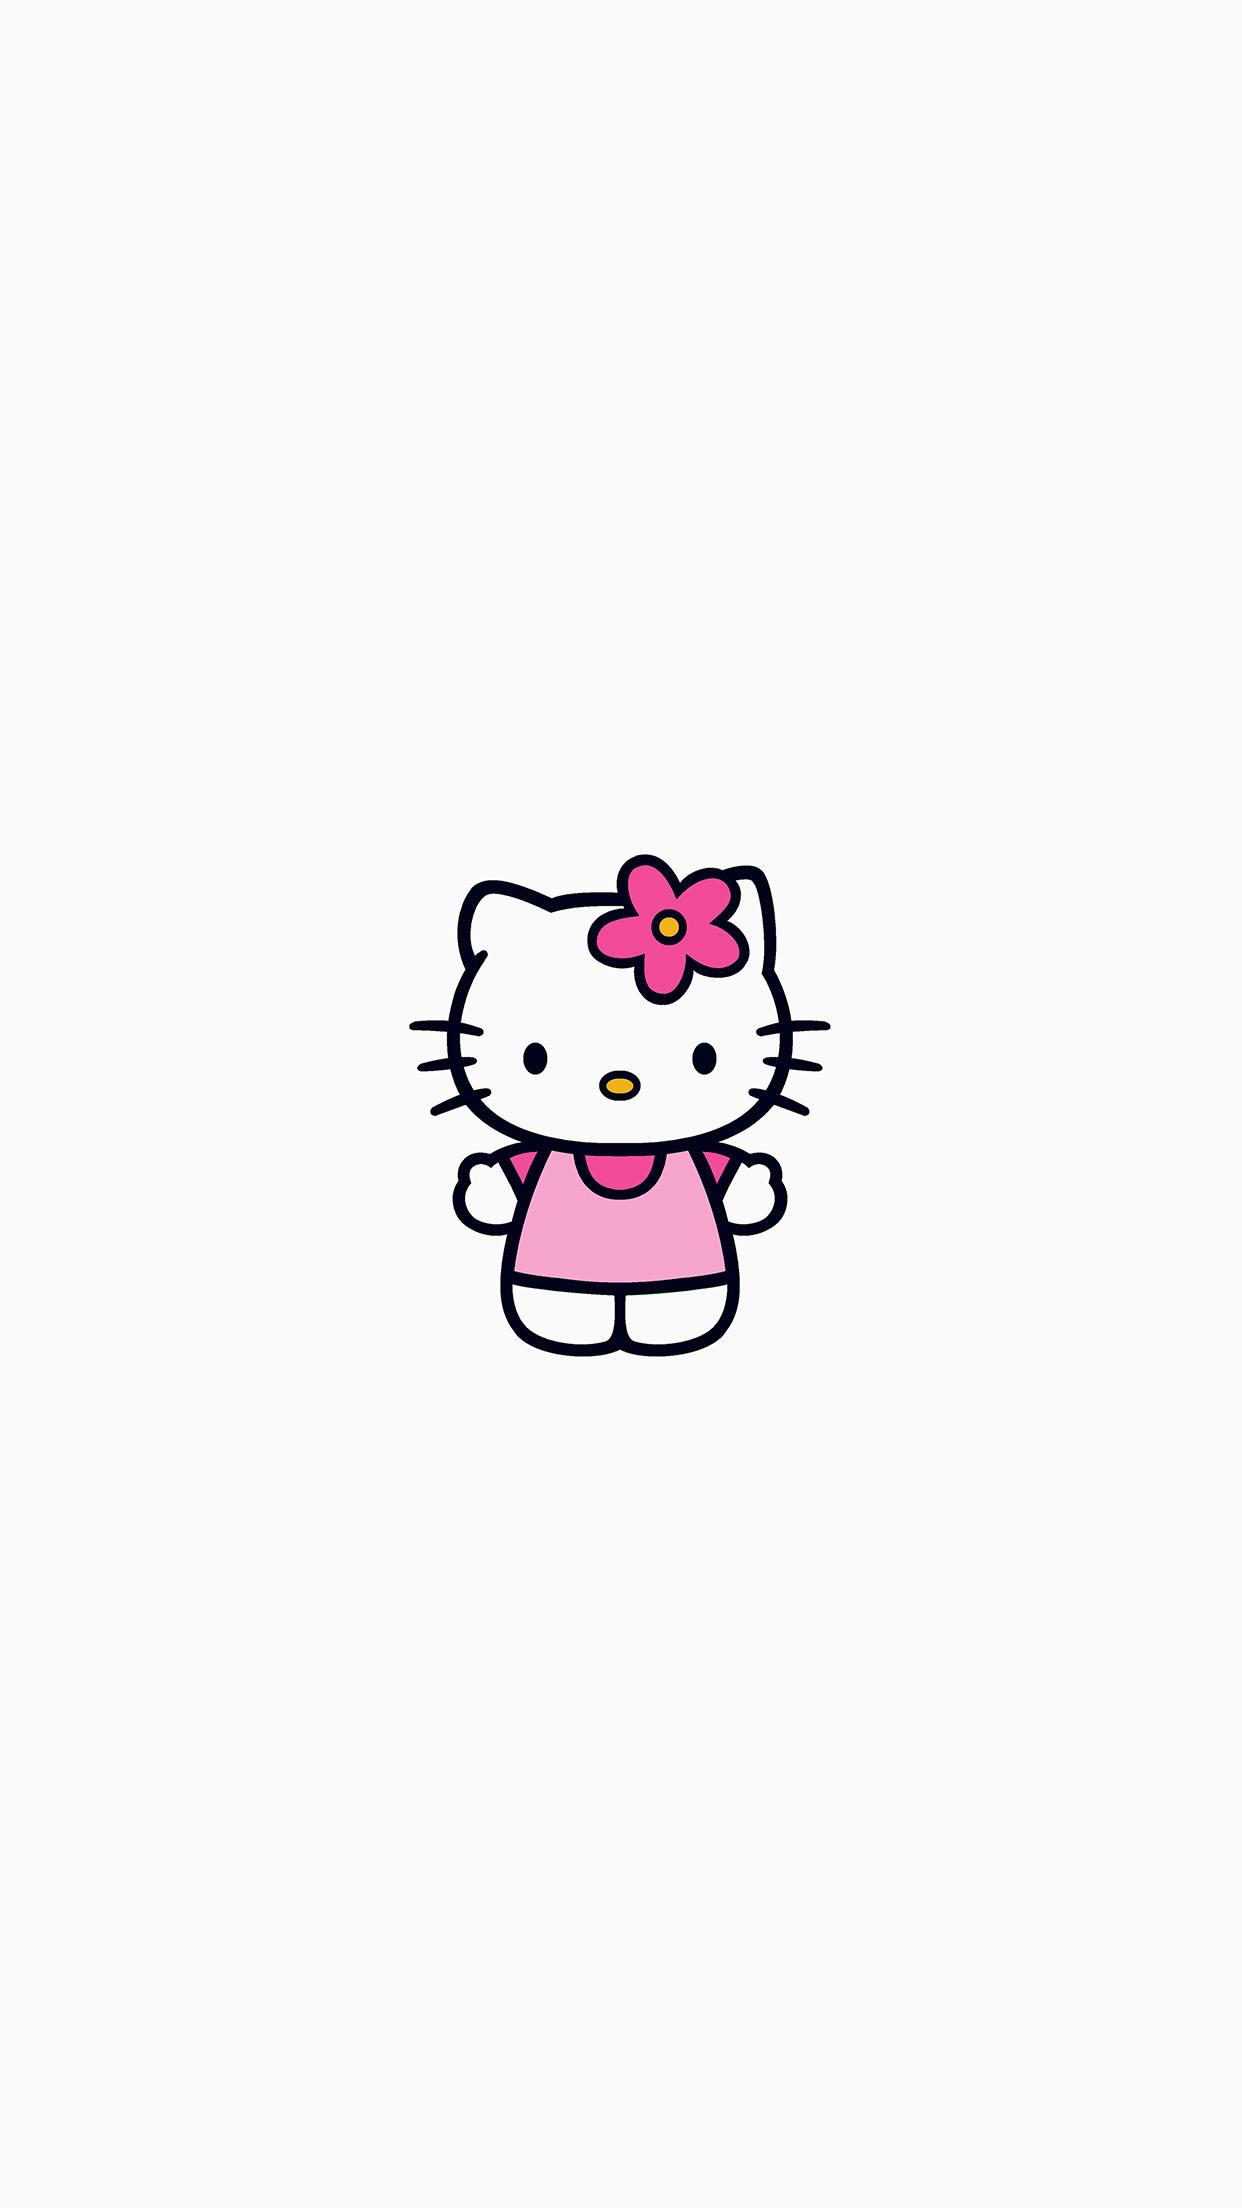 Iphonepapers Com Iphone 8 Wallpaper Ar87 Hello Kitty Logo Cute